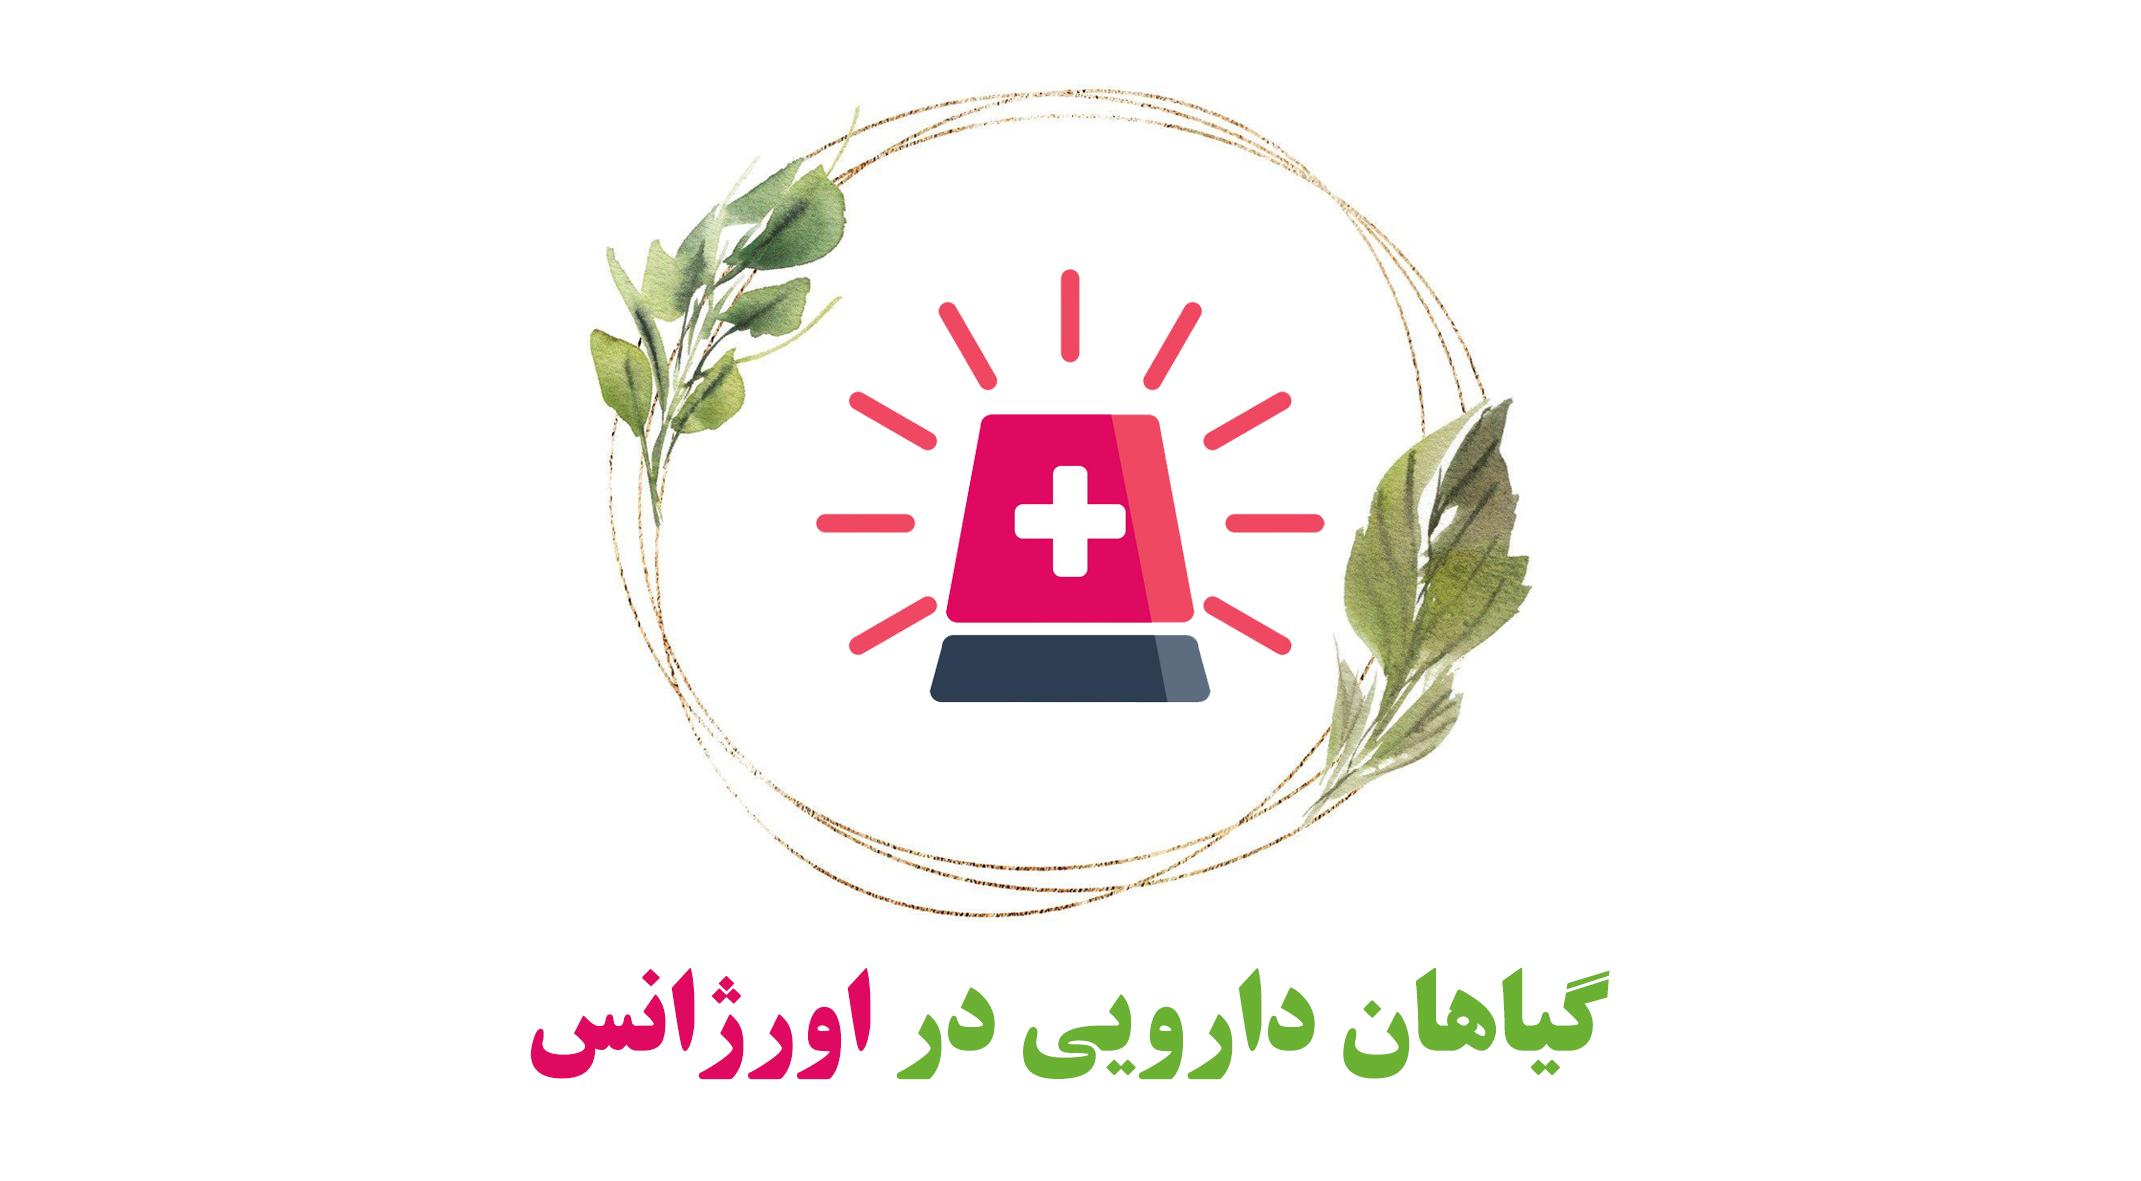 کاربرد گیاهان دارویی در اورژانس 1